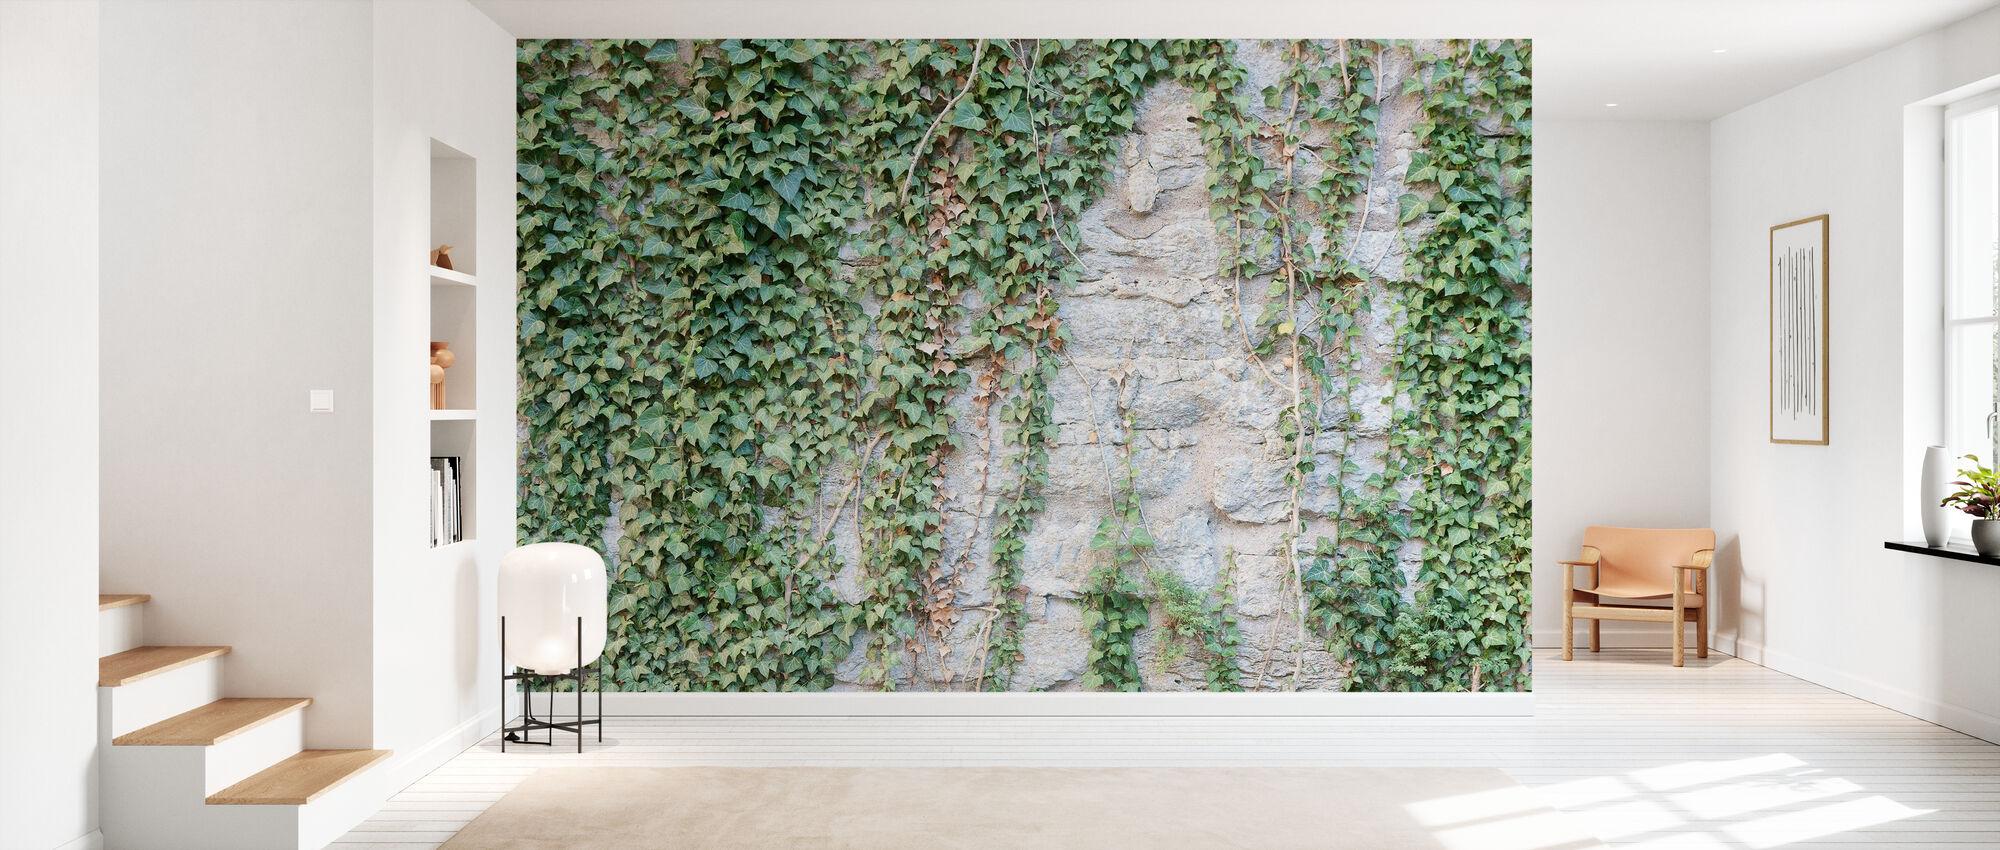 Murgröna vägg - Tapet - Hall